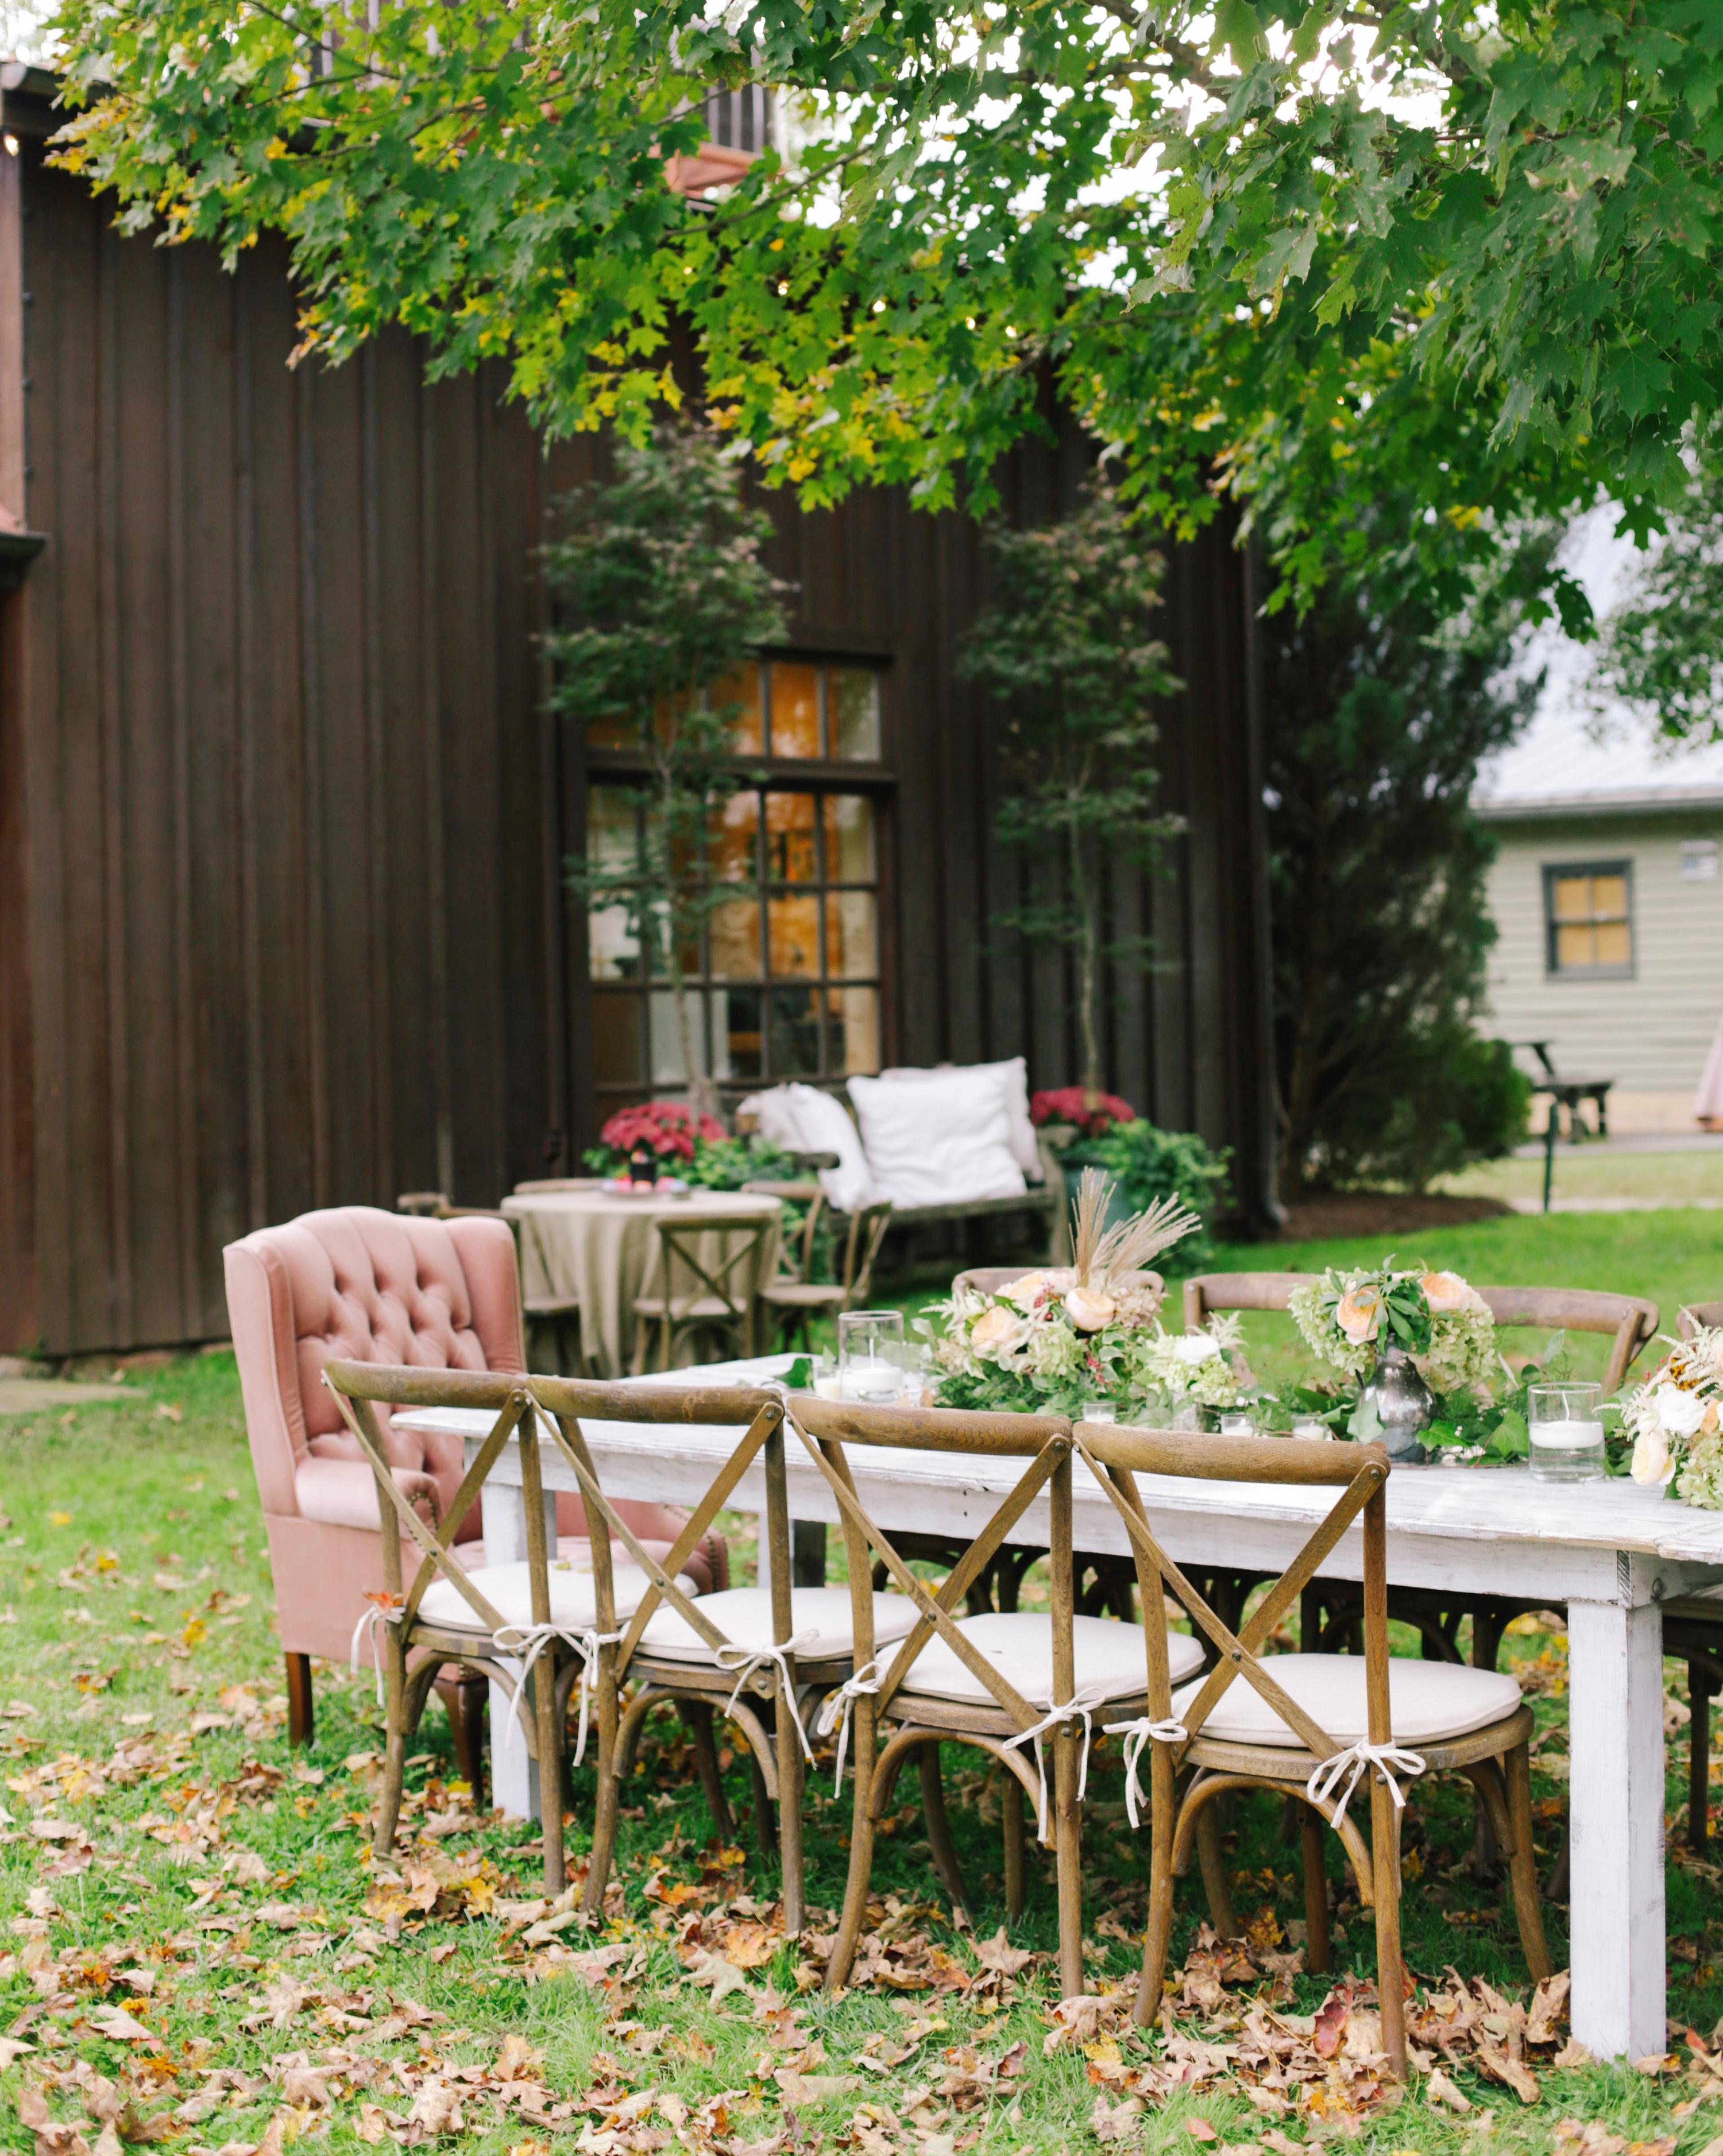 destiny-taylor-wedding-table-322-s112347-1115.jpg